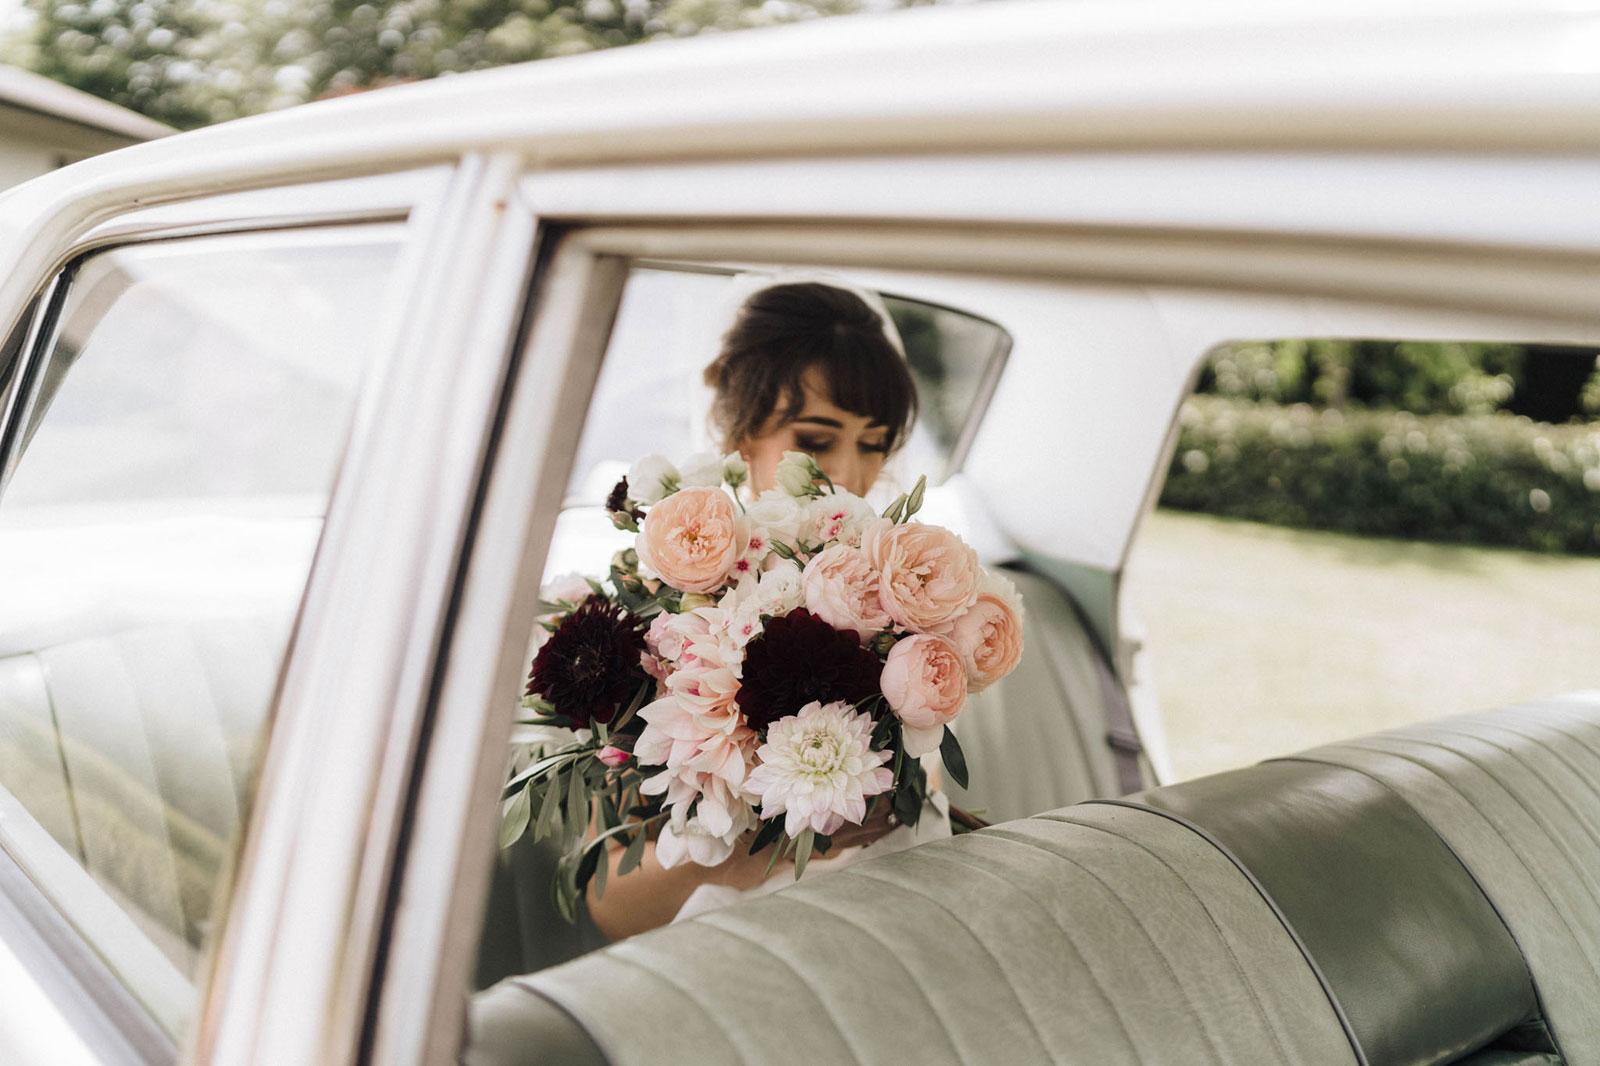 newfound-n-c-olive-tree-cottage-tauranga-wedding-photographer-223